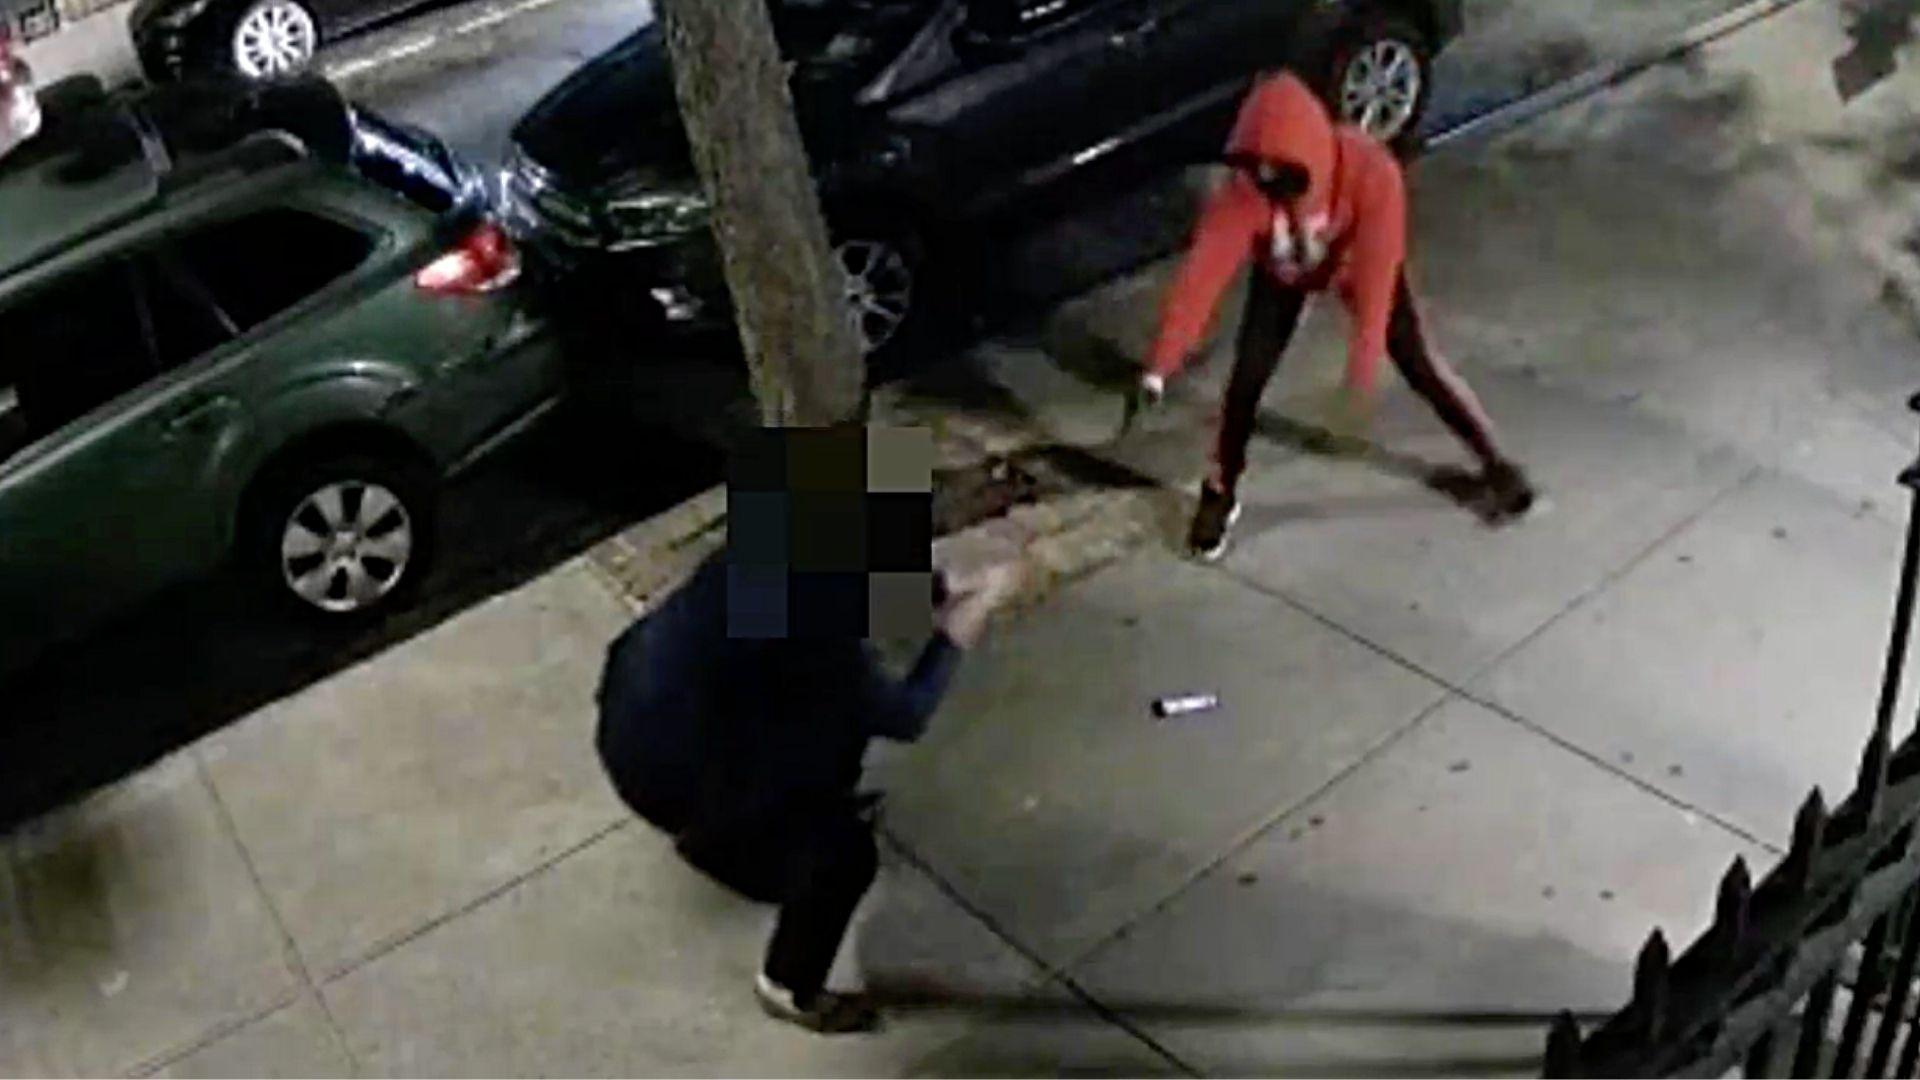 Kips Bay robbery at gunpoint